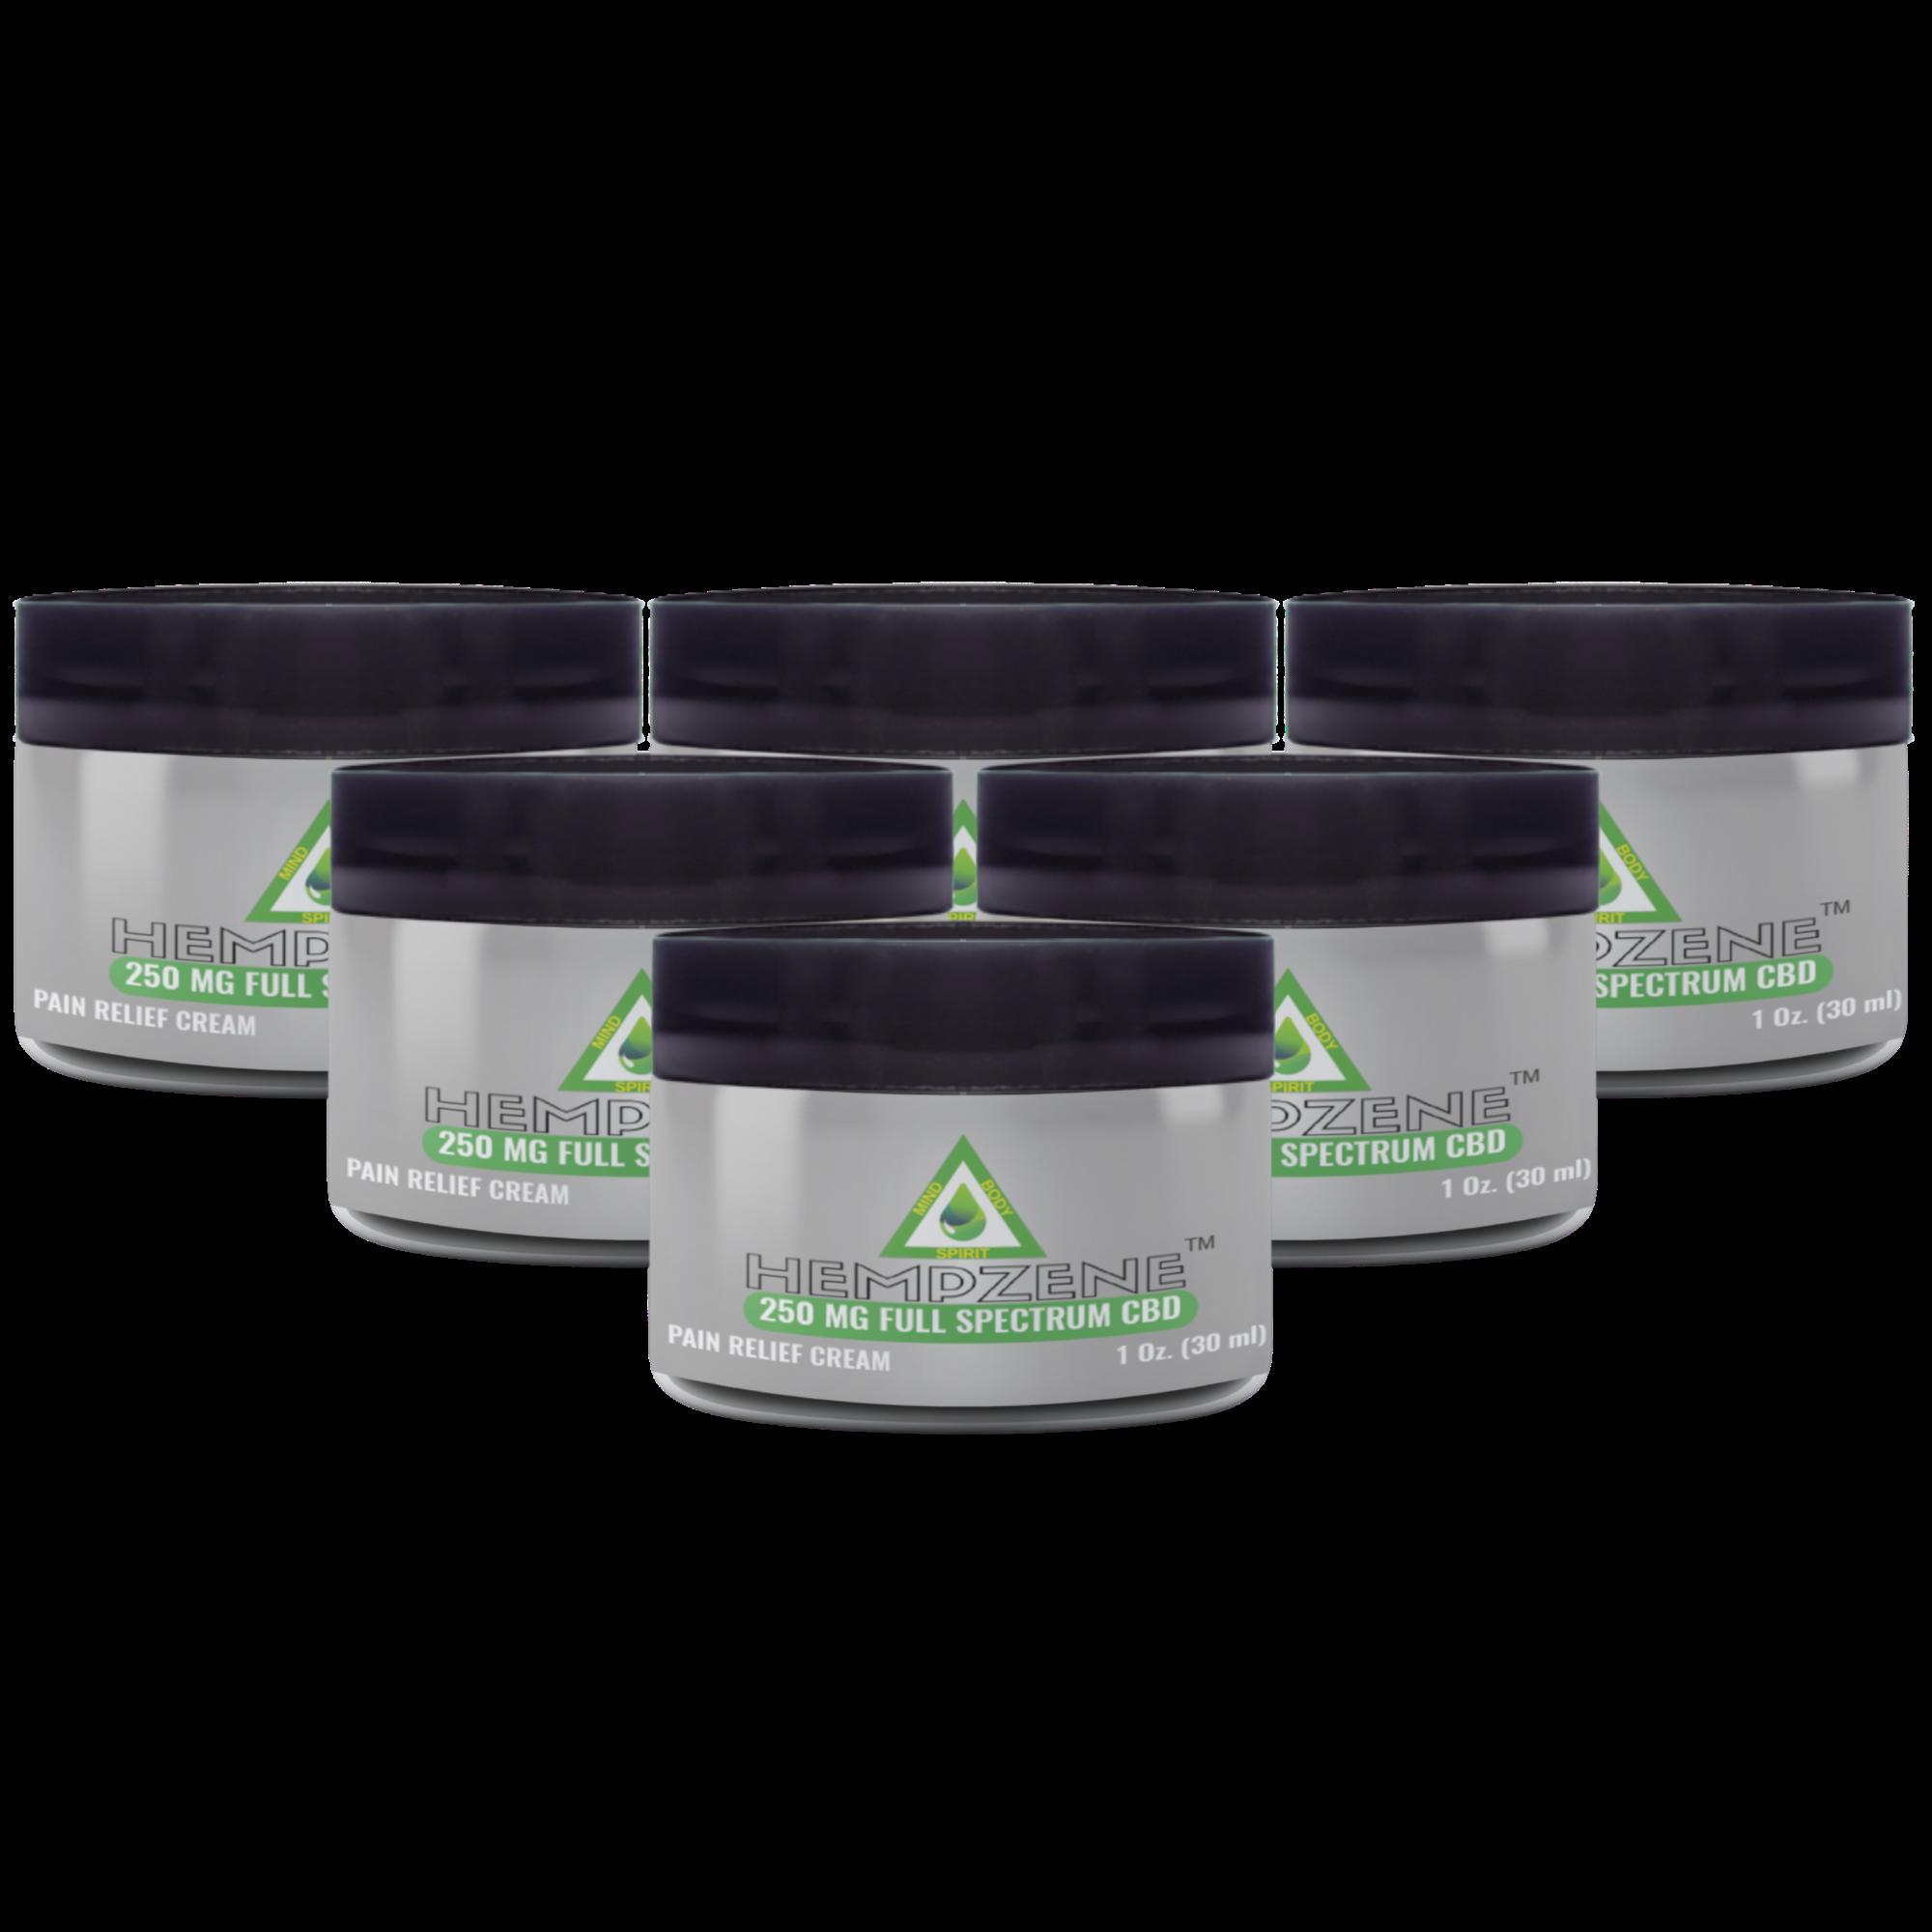 Hempzene CBD Relief Cream - 250 MG - 6 Jars